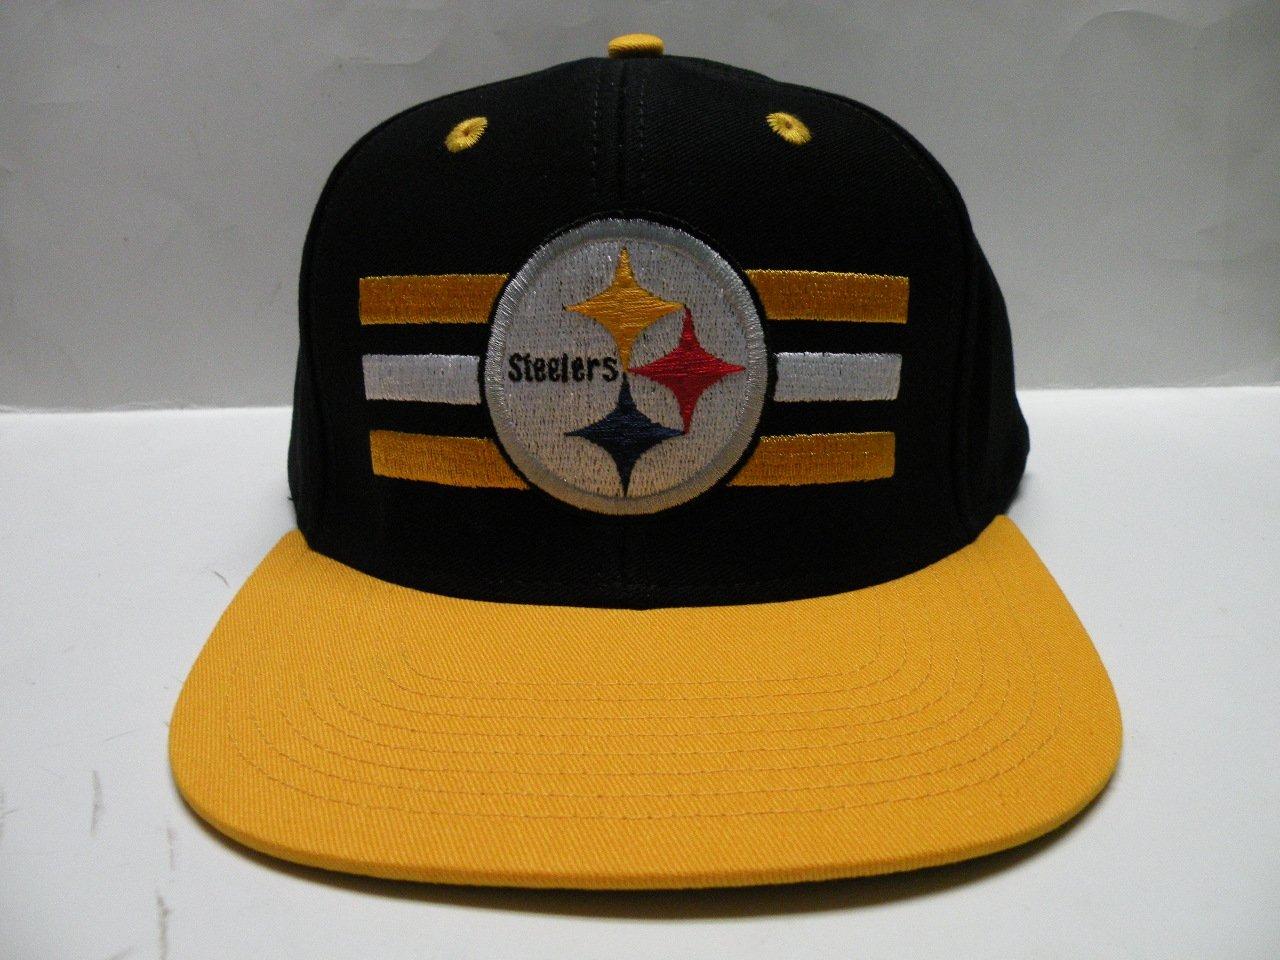 8cde3d908 Get Quotations · NFL Pittsburgh Steelers Horizon Black Gold 2 Tone Retro Snapback  Cap